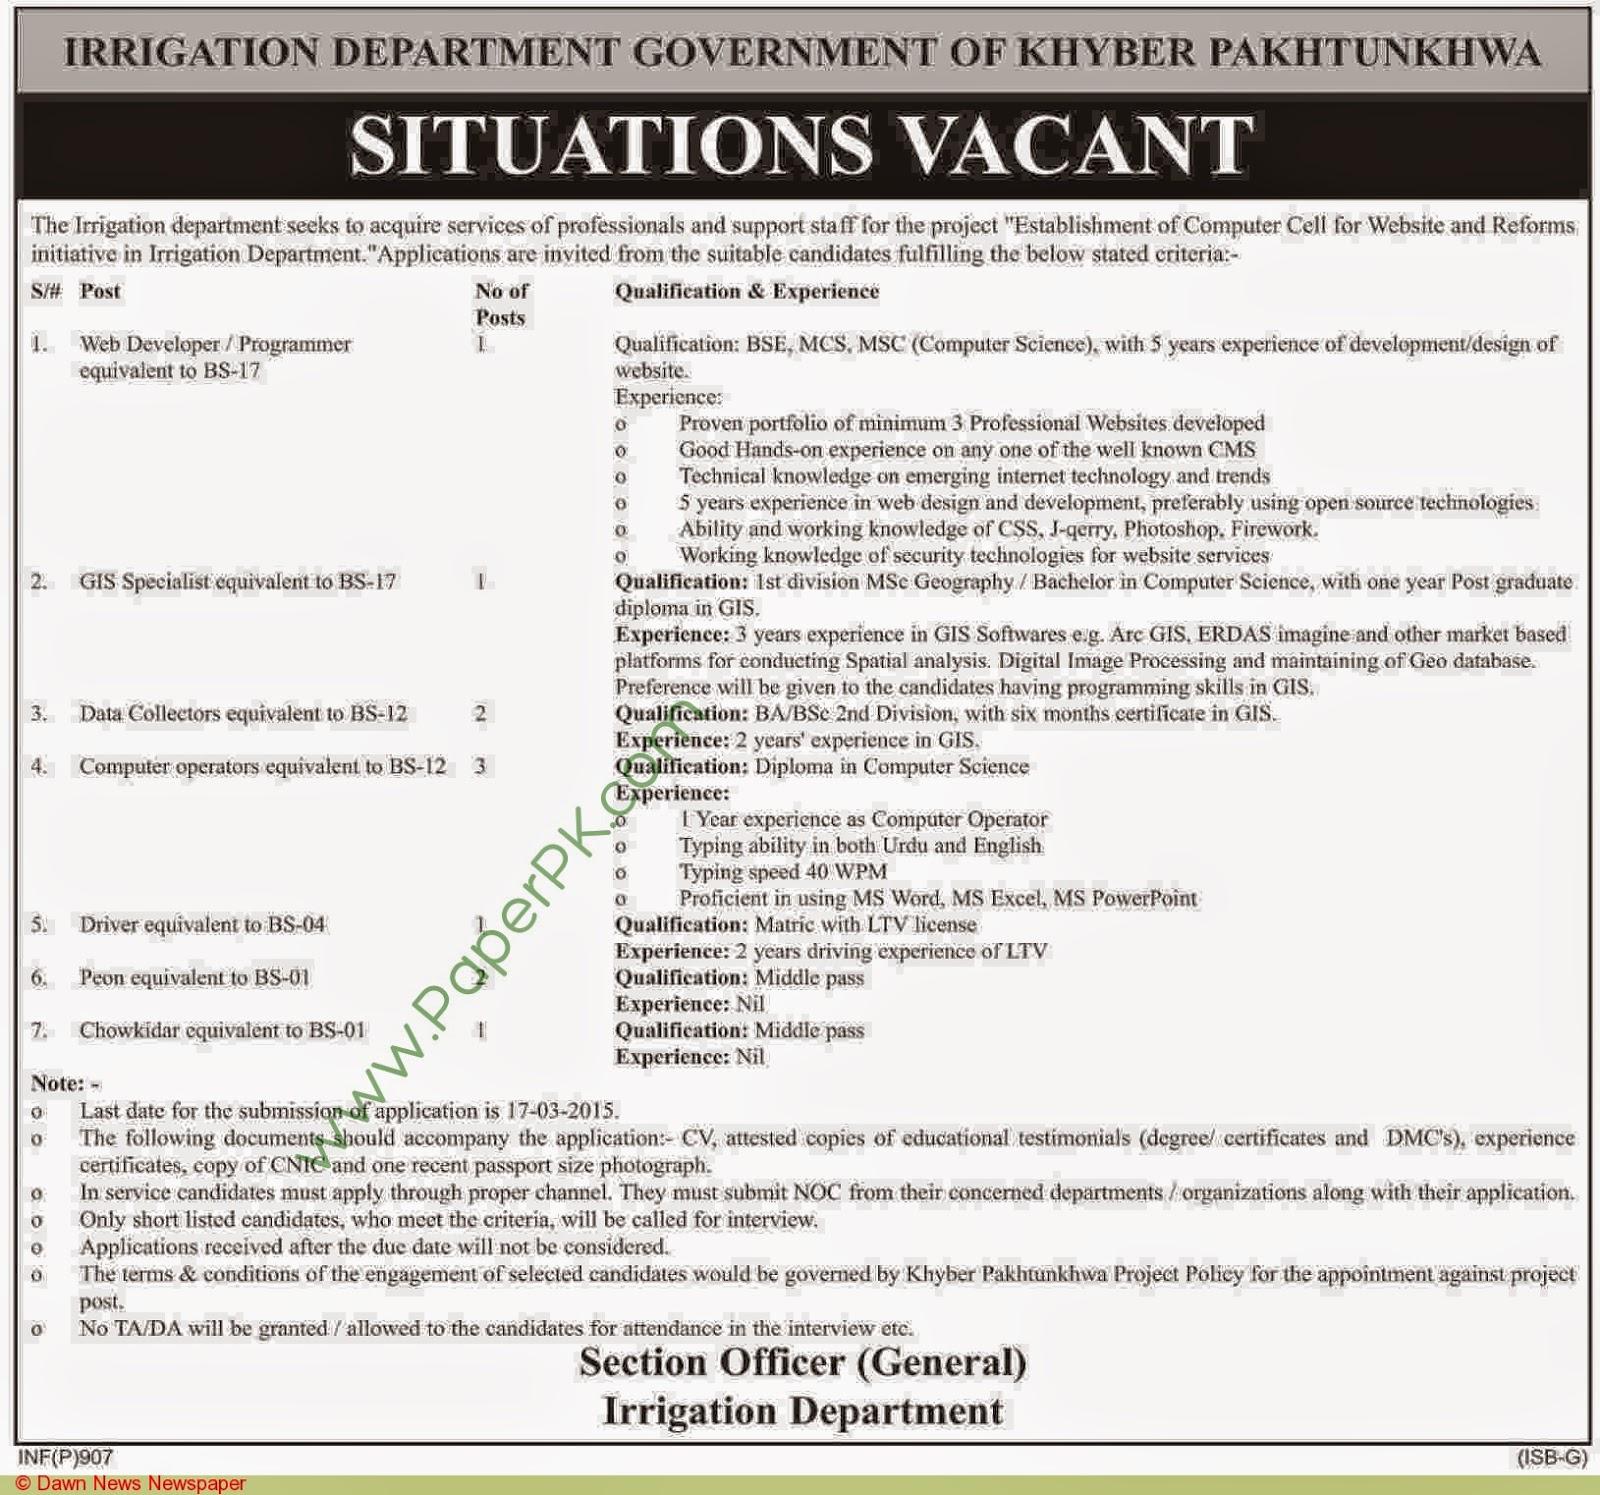 irrigation department kpk jobs 2015 paperpak jobs in irrigation department kpk jobs 2015